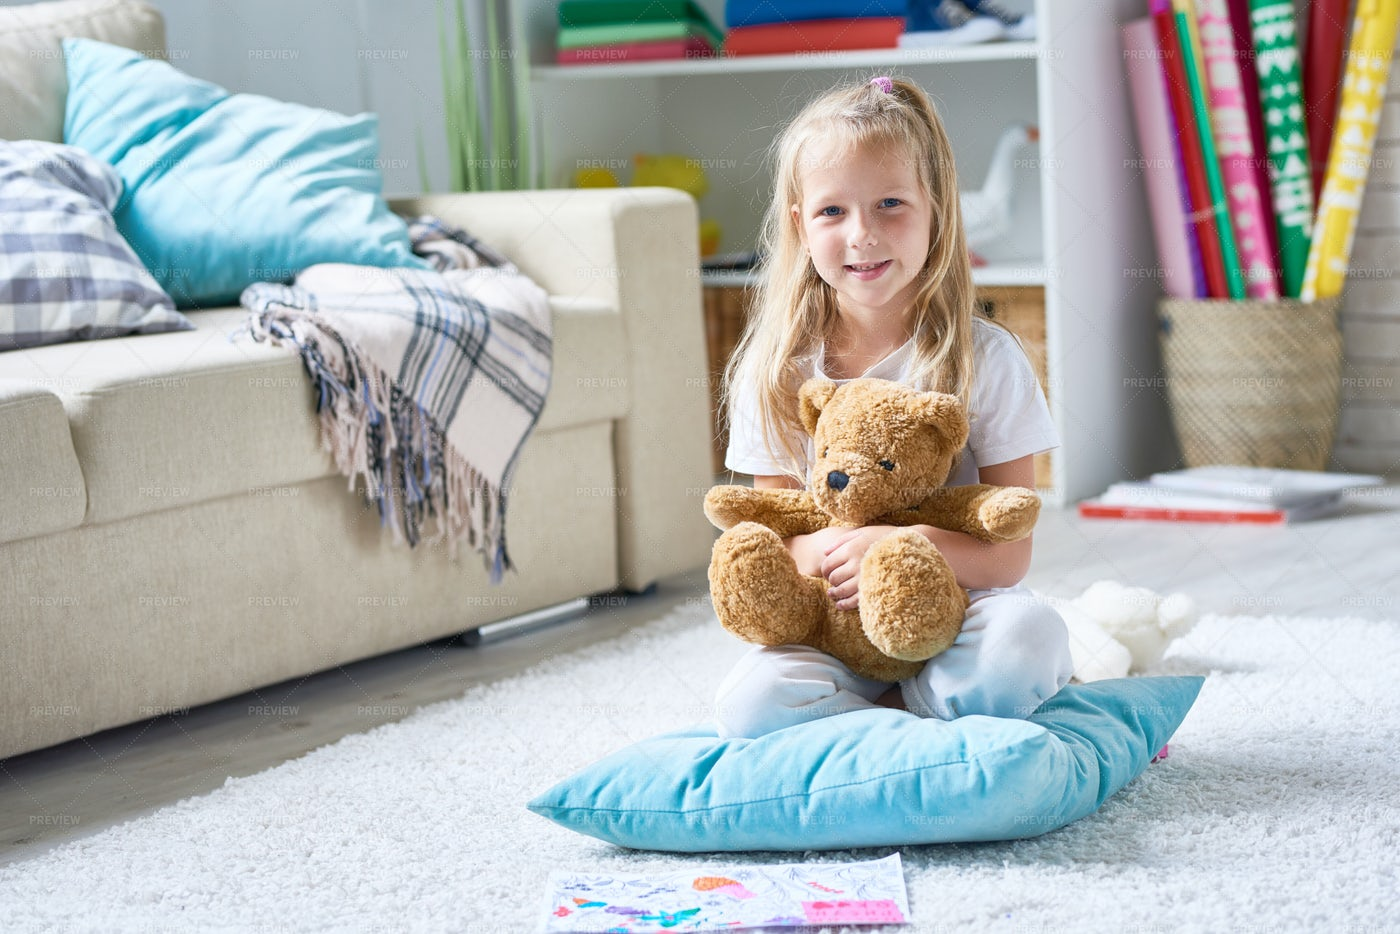 Adorable Little Girl With Teddy...: Stock Photos